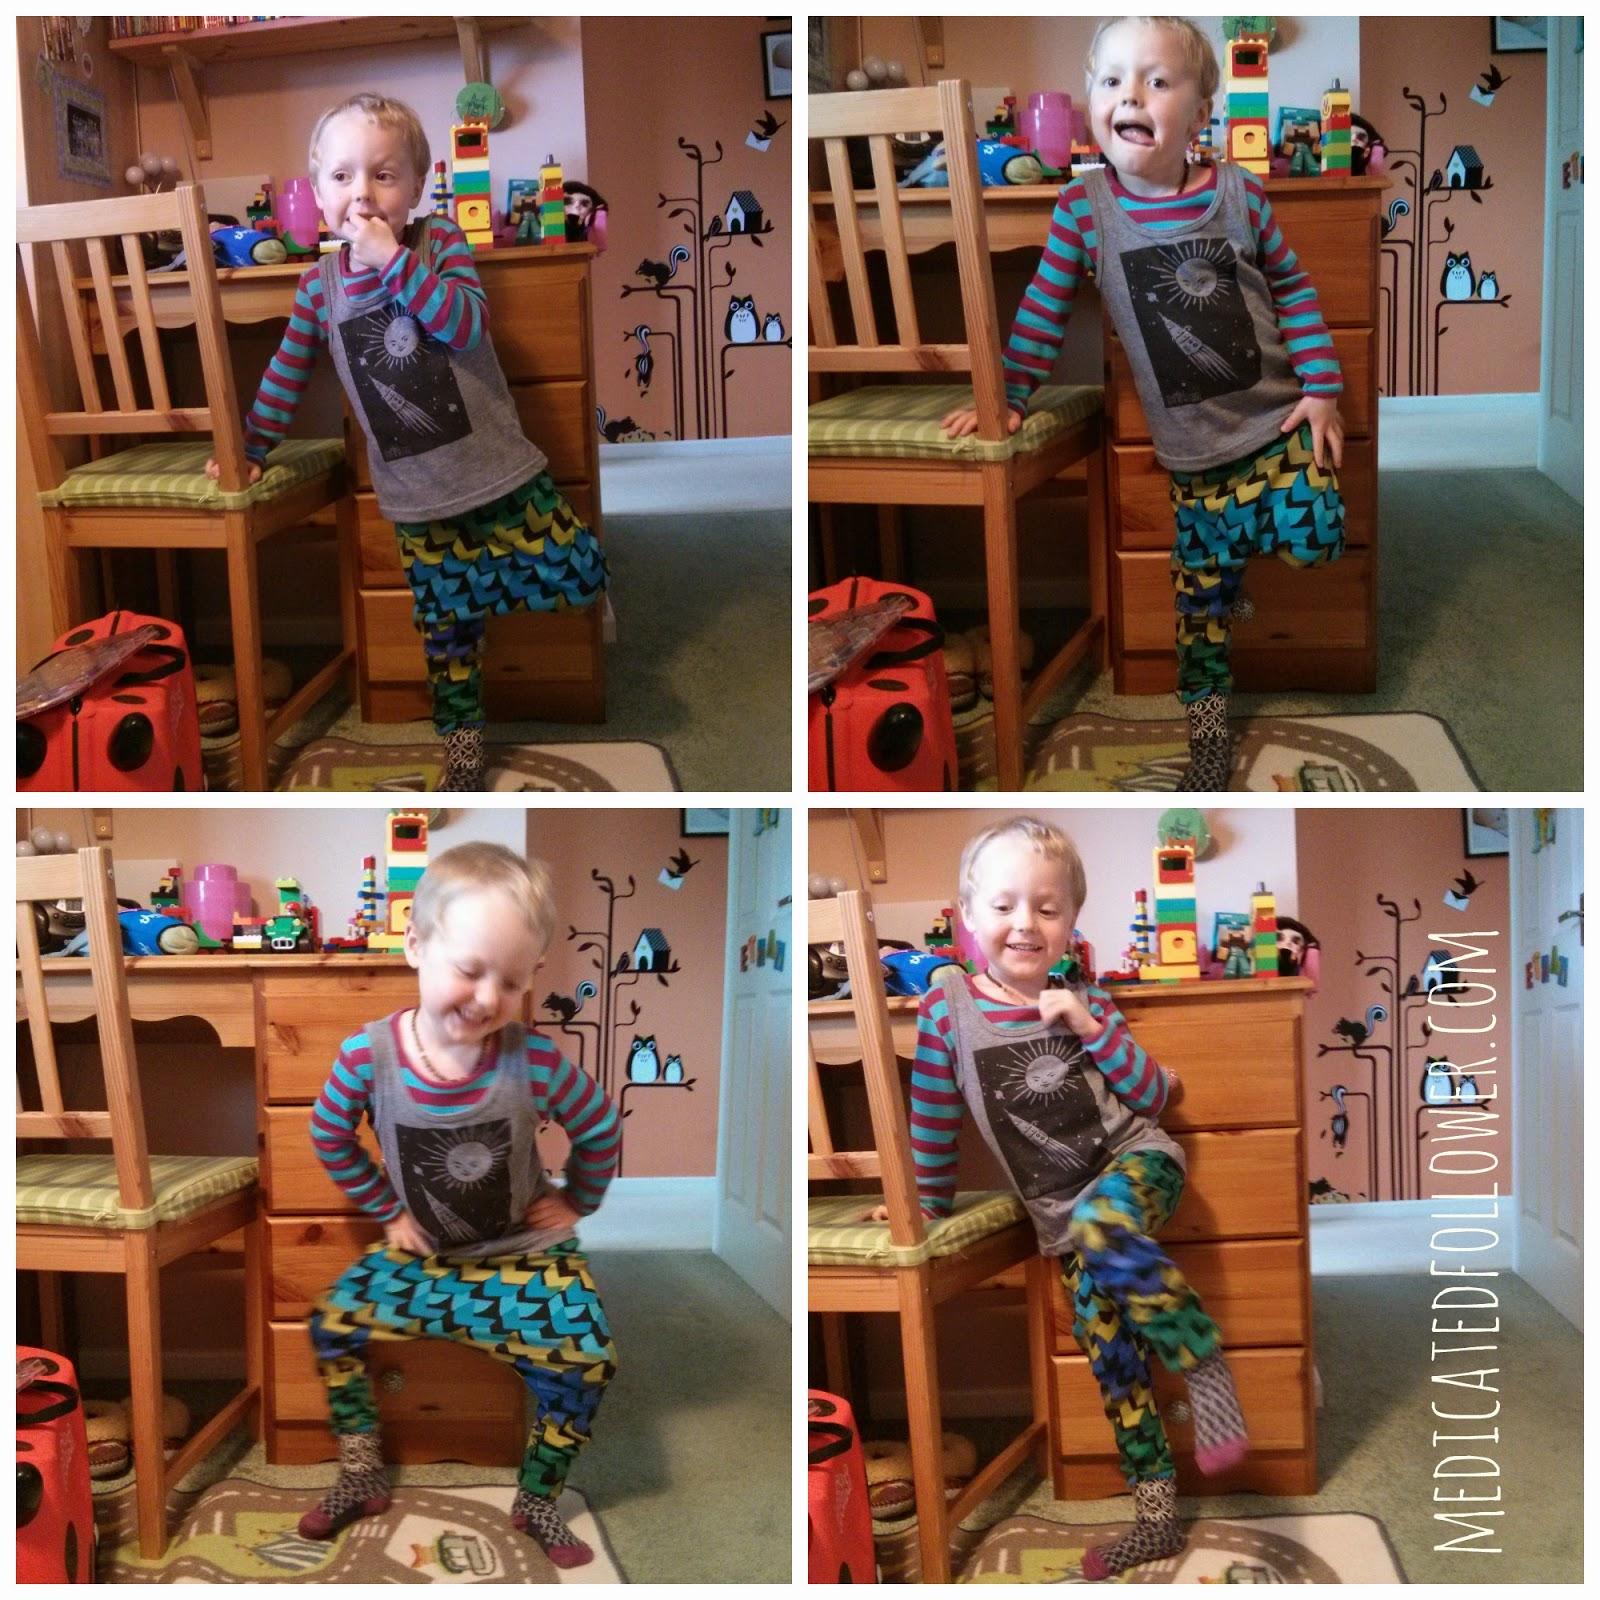 The Mini Classy  Harems  Vest Kids Fashion Medicated Follower of Fashion